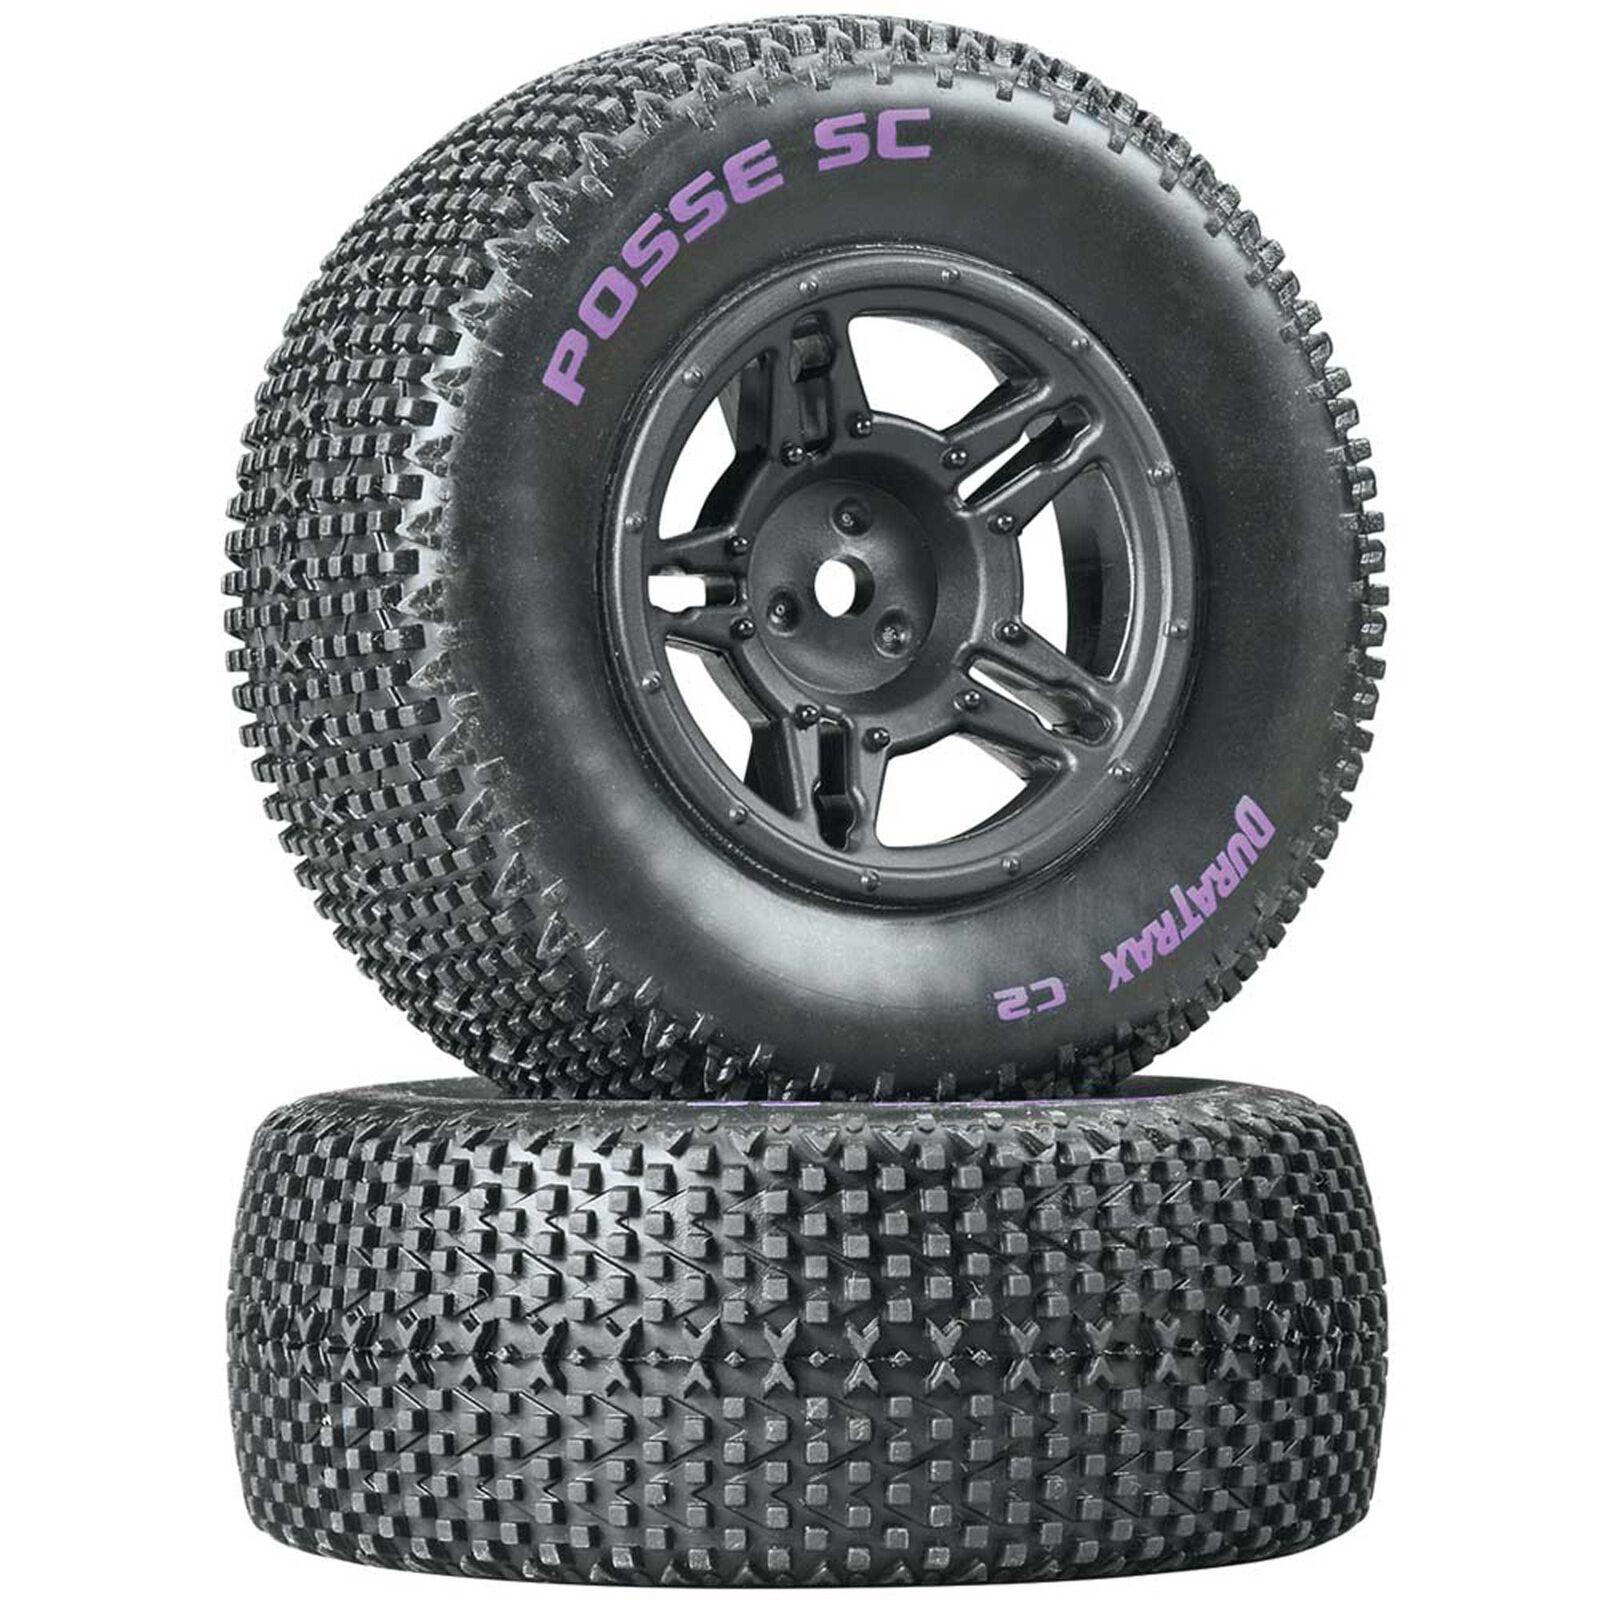 Posse SC C2 Mounted Tires, Rear Slash (2)